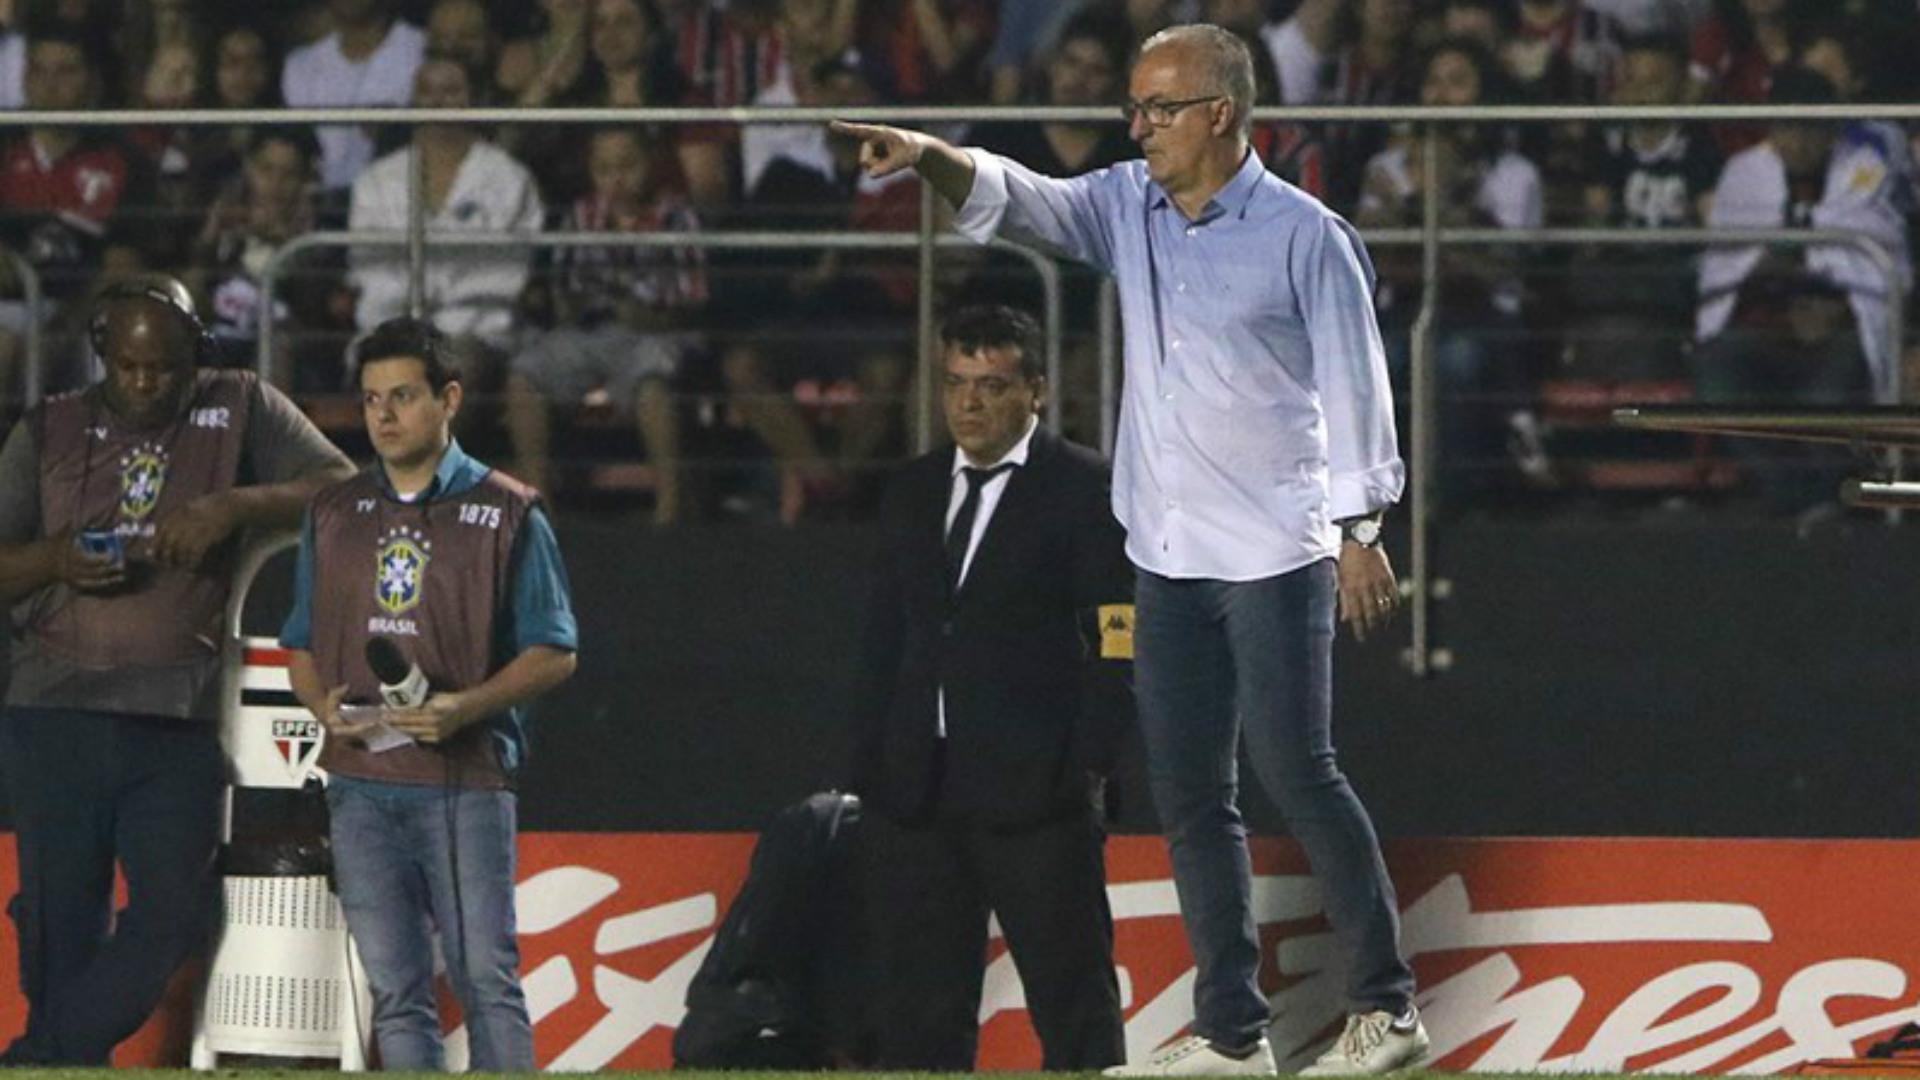 Dorival Júnior - São Paulo x Ponte Preta - 9/09/2017